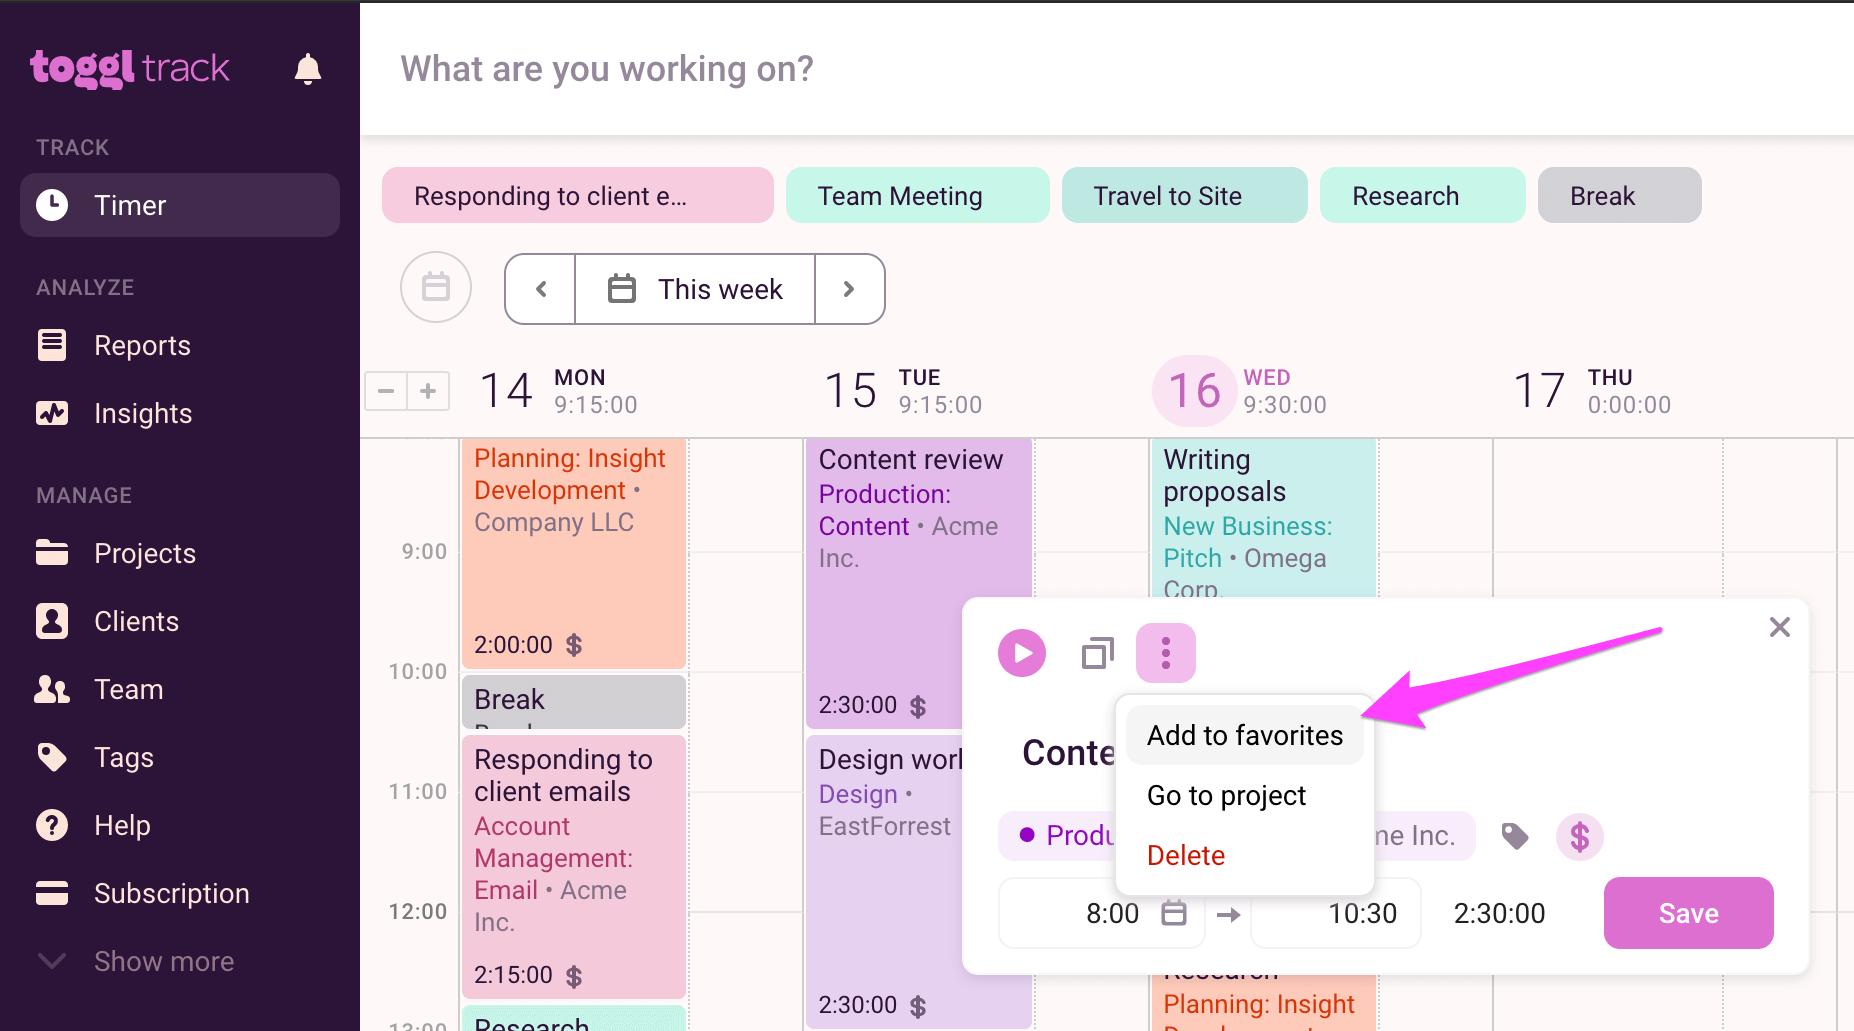 Creating Favorites from Calendar